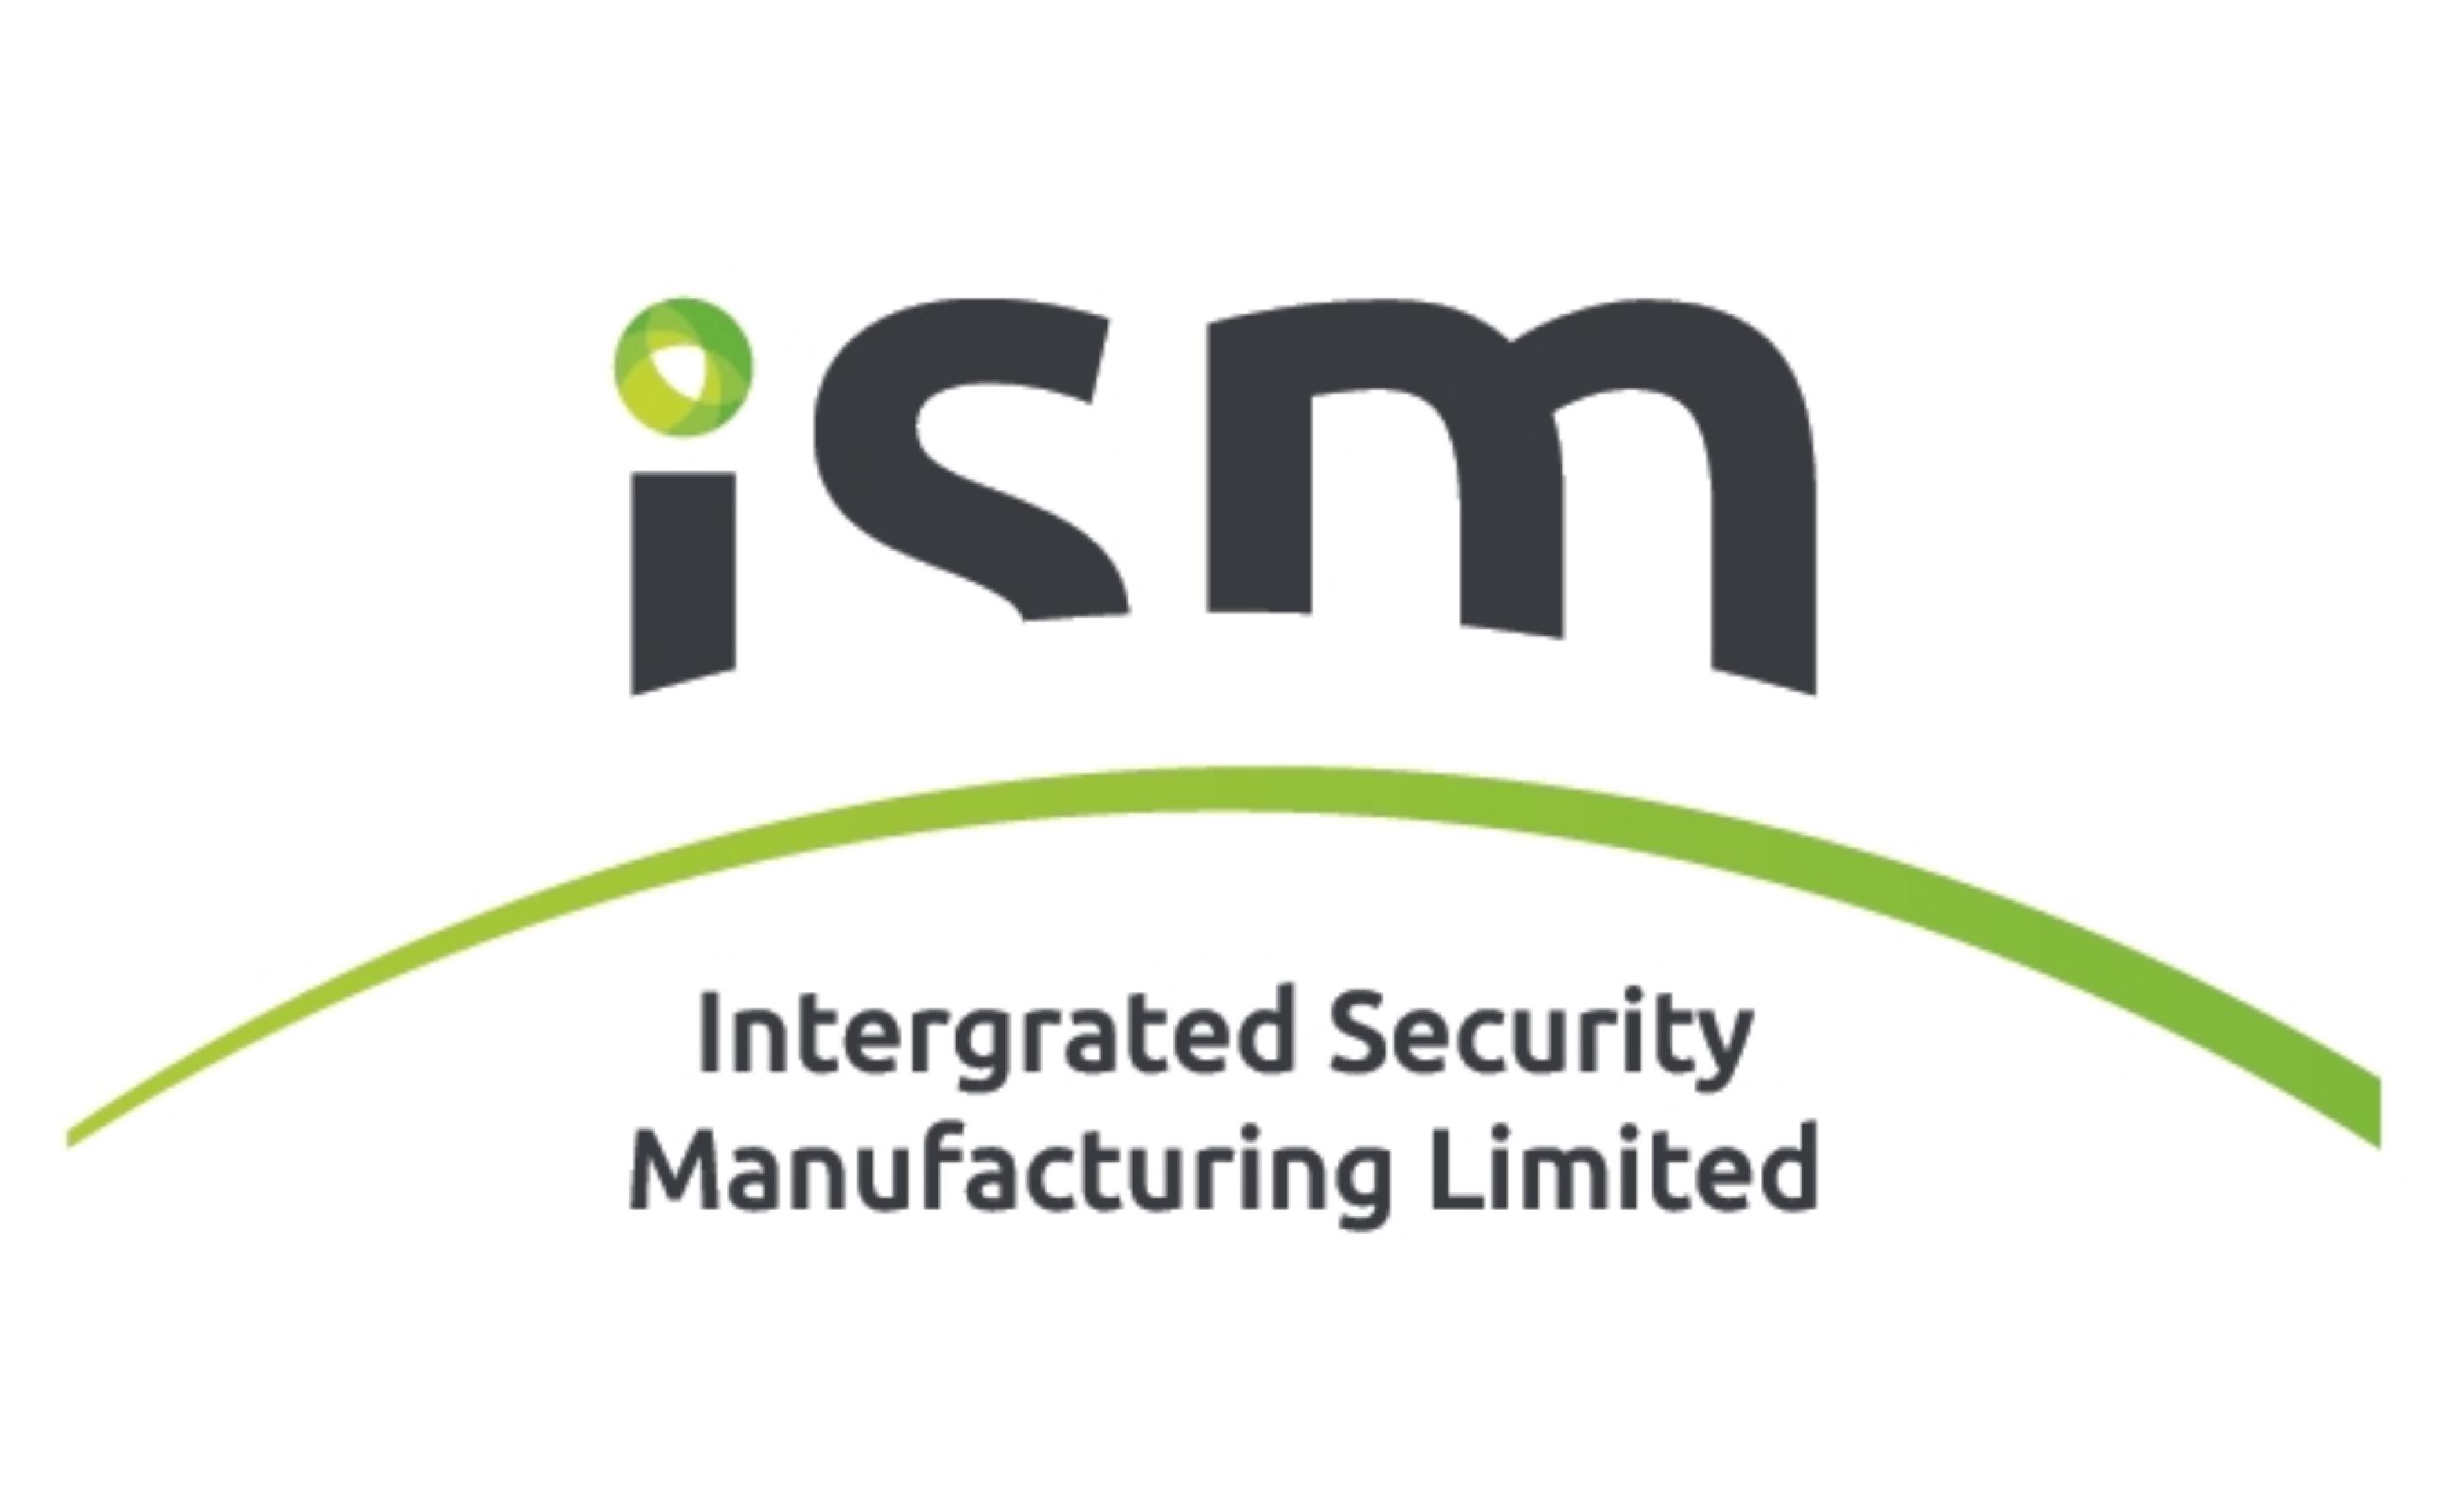 ISM-01